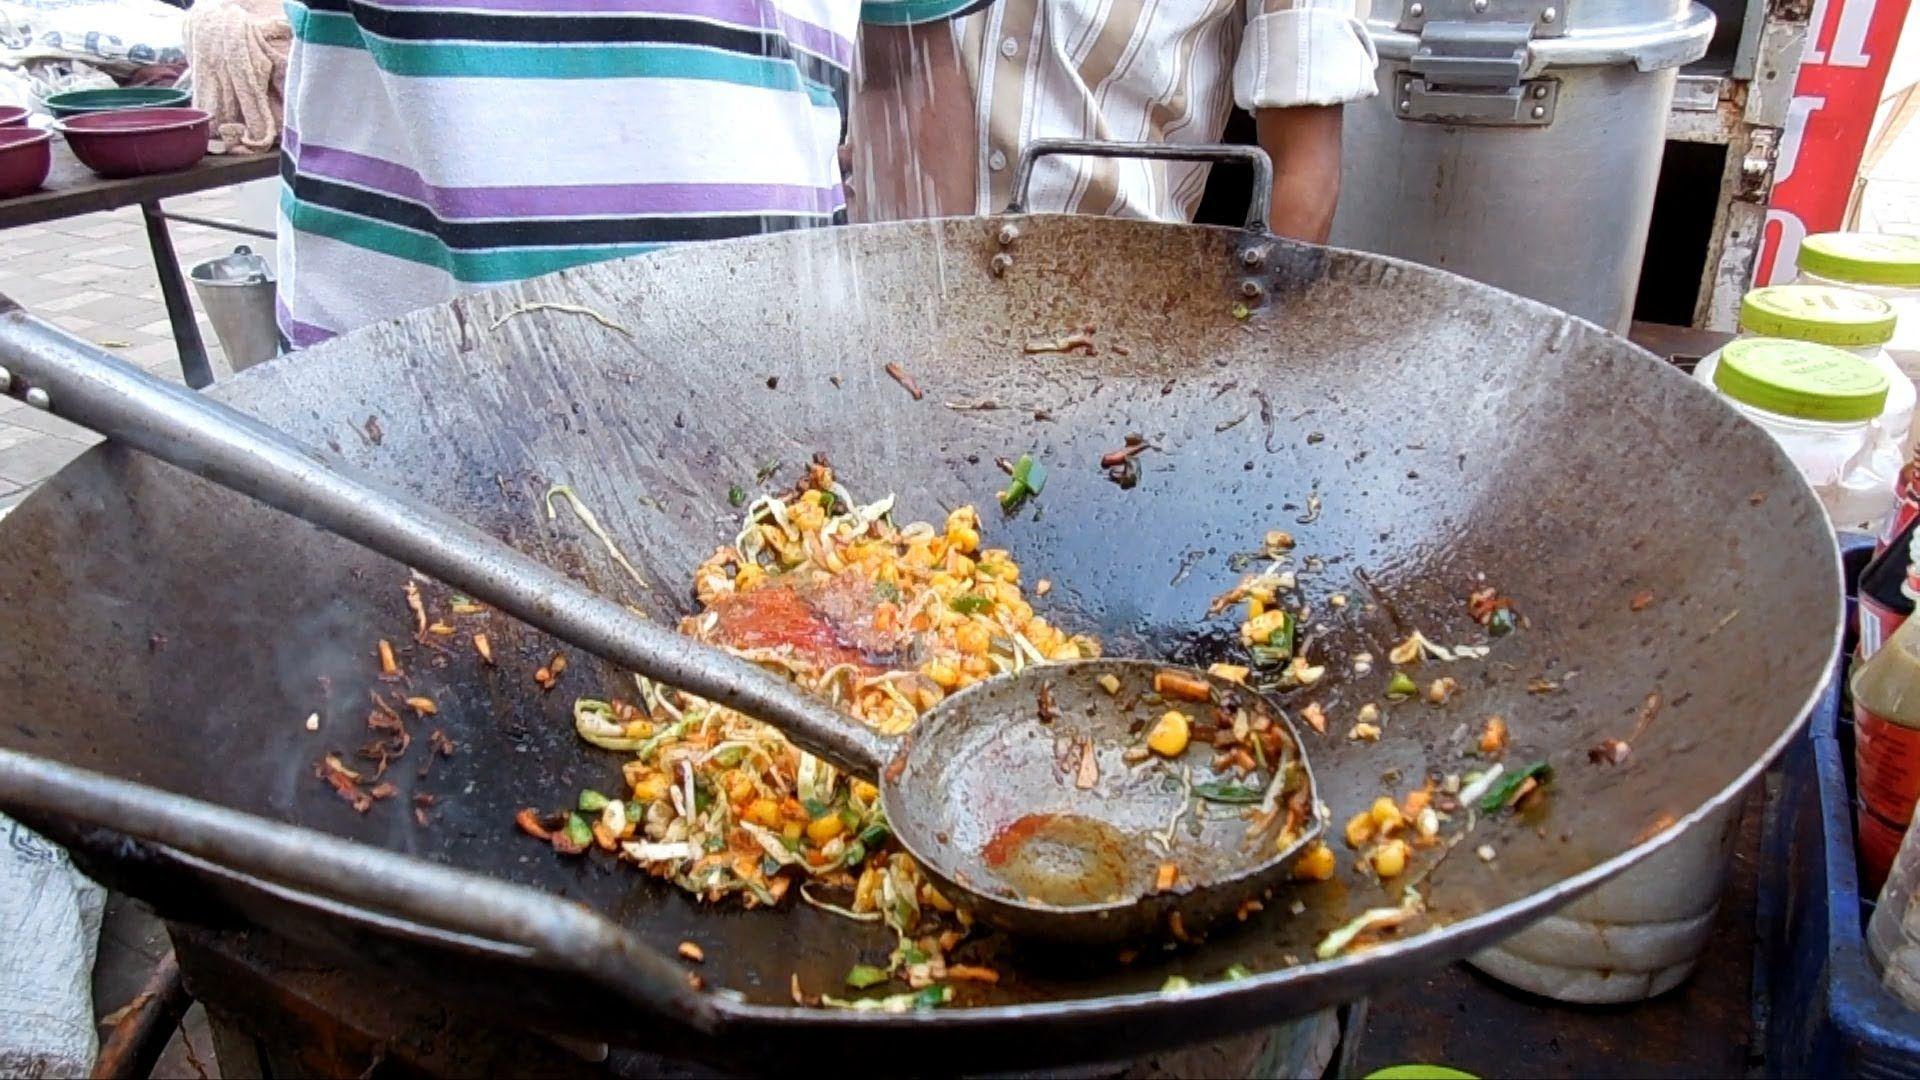 Indian street food scene the skillful master chefs in the street indian street food scene the skillful master chefs in the street kit httpyoutubewatchv1mg4g28sxru forumfinder Choice Image